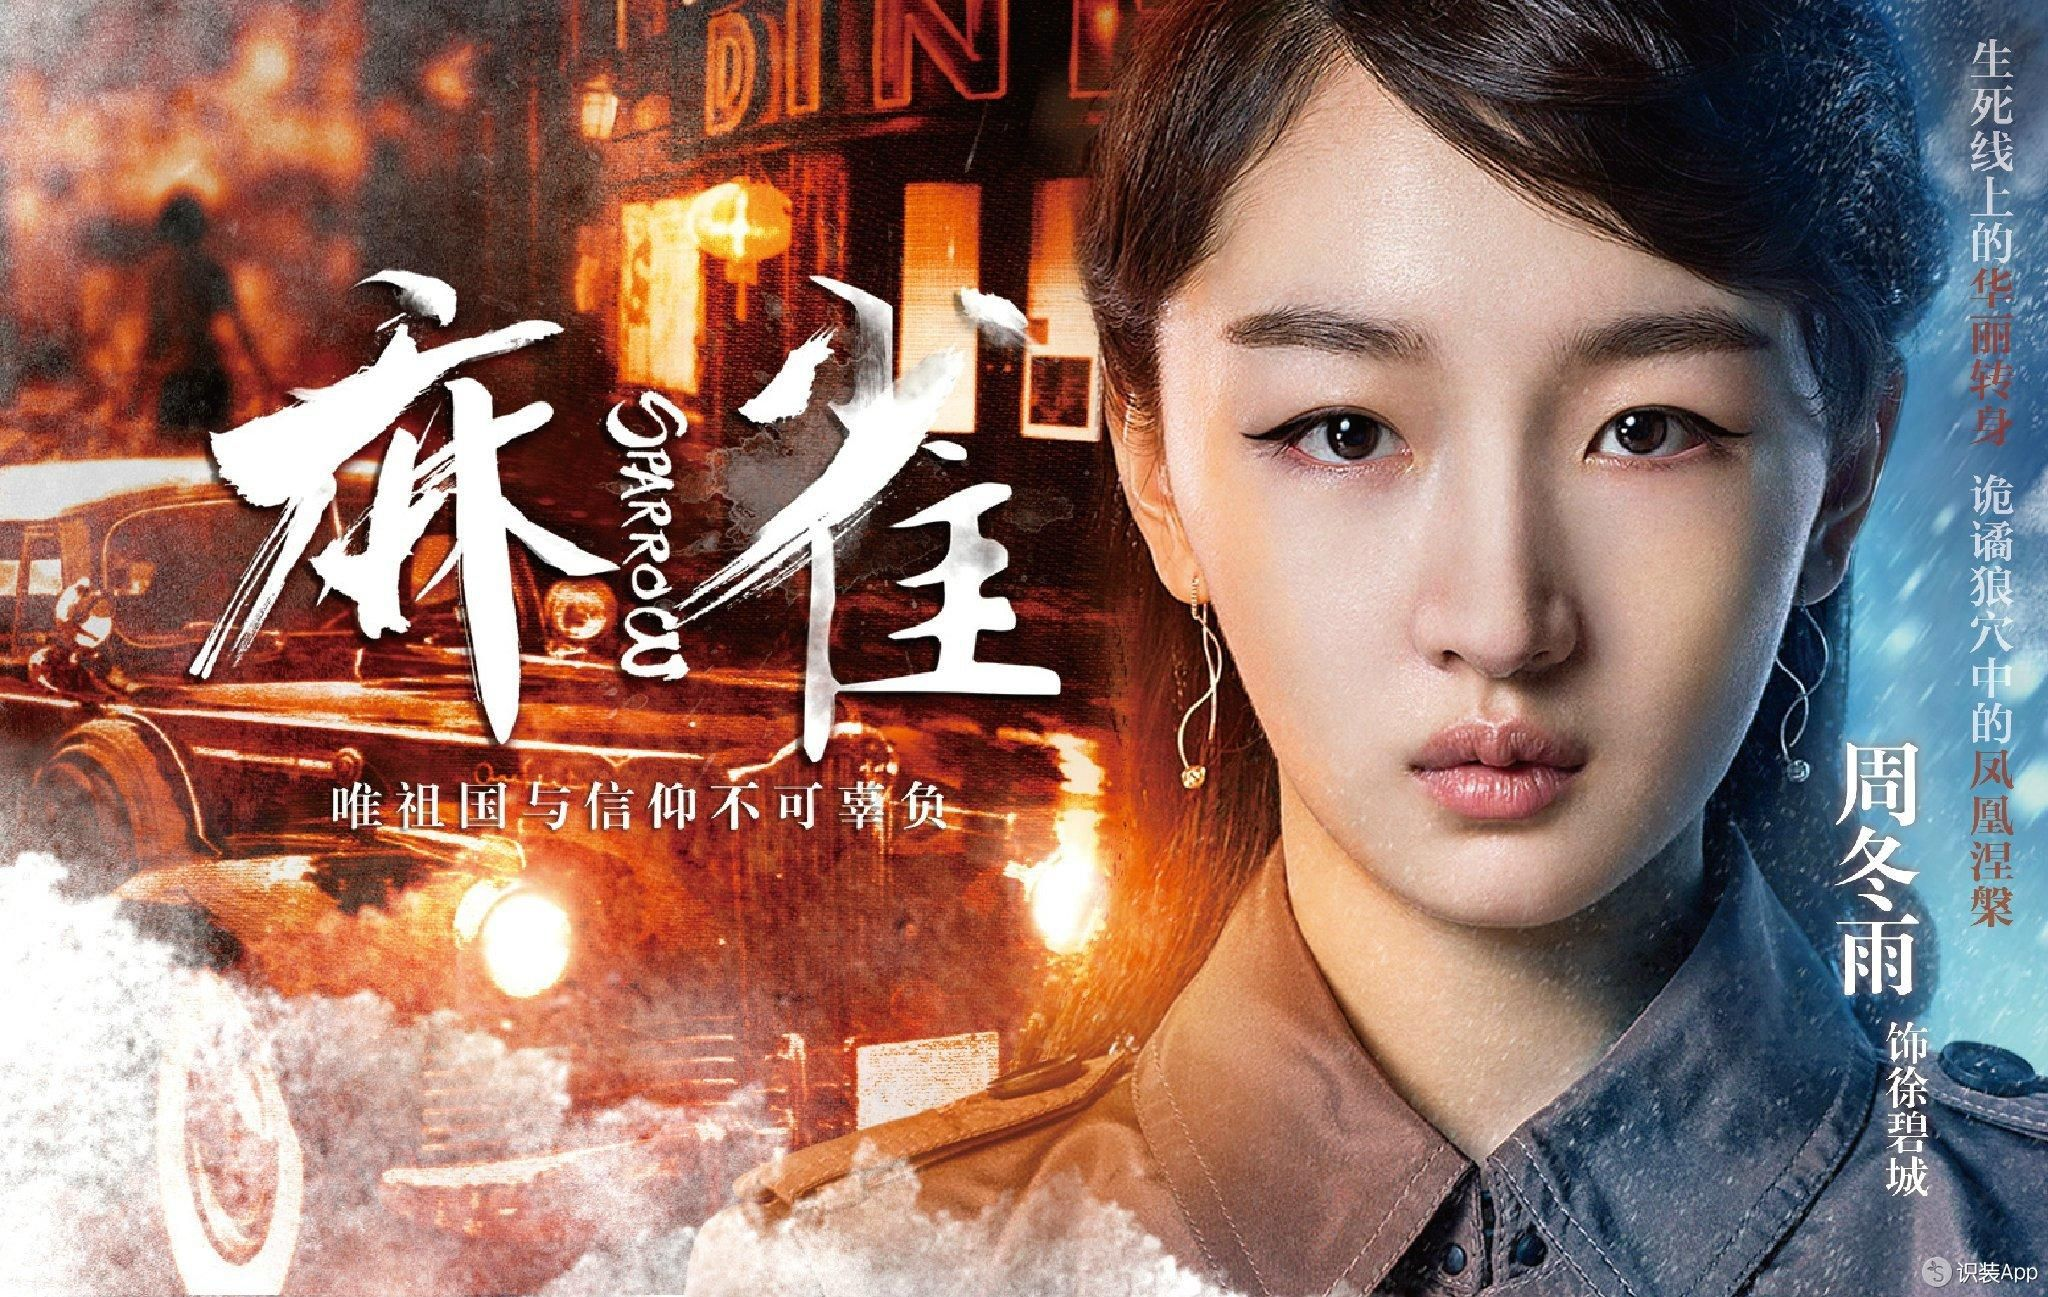 麻雀 周冬雨 Sparrow, Tv soap, Movies 2016